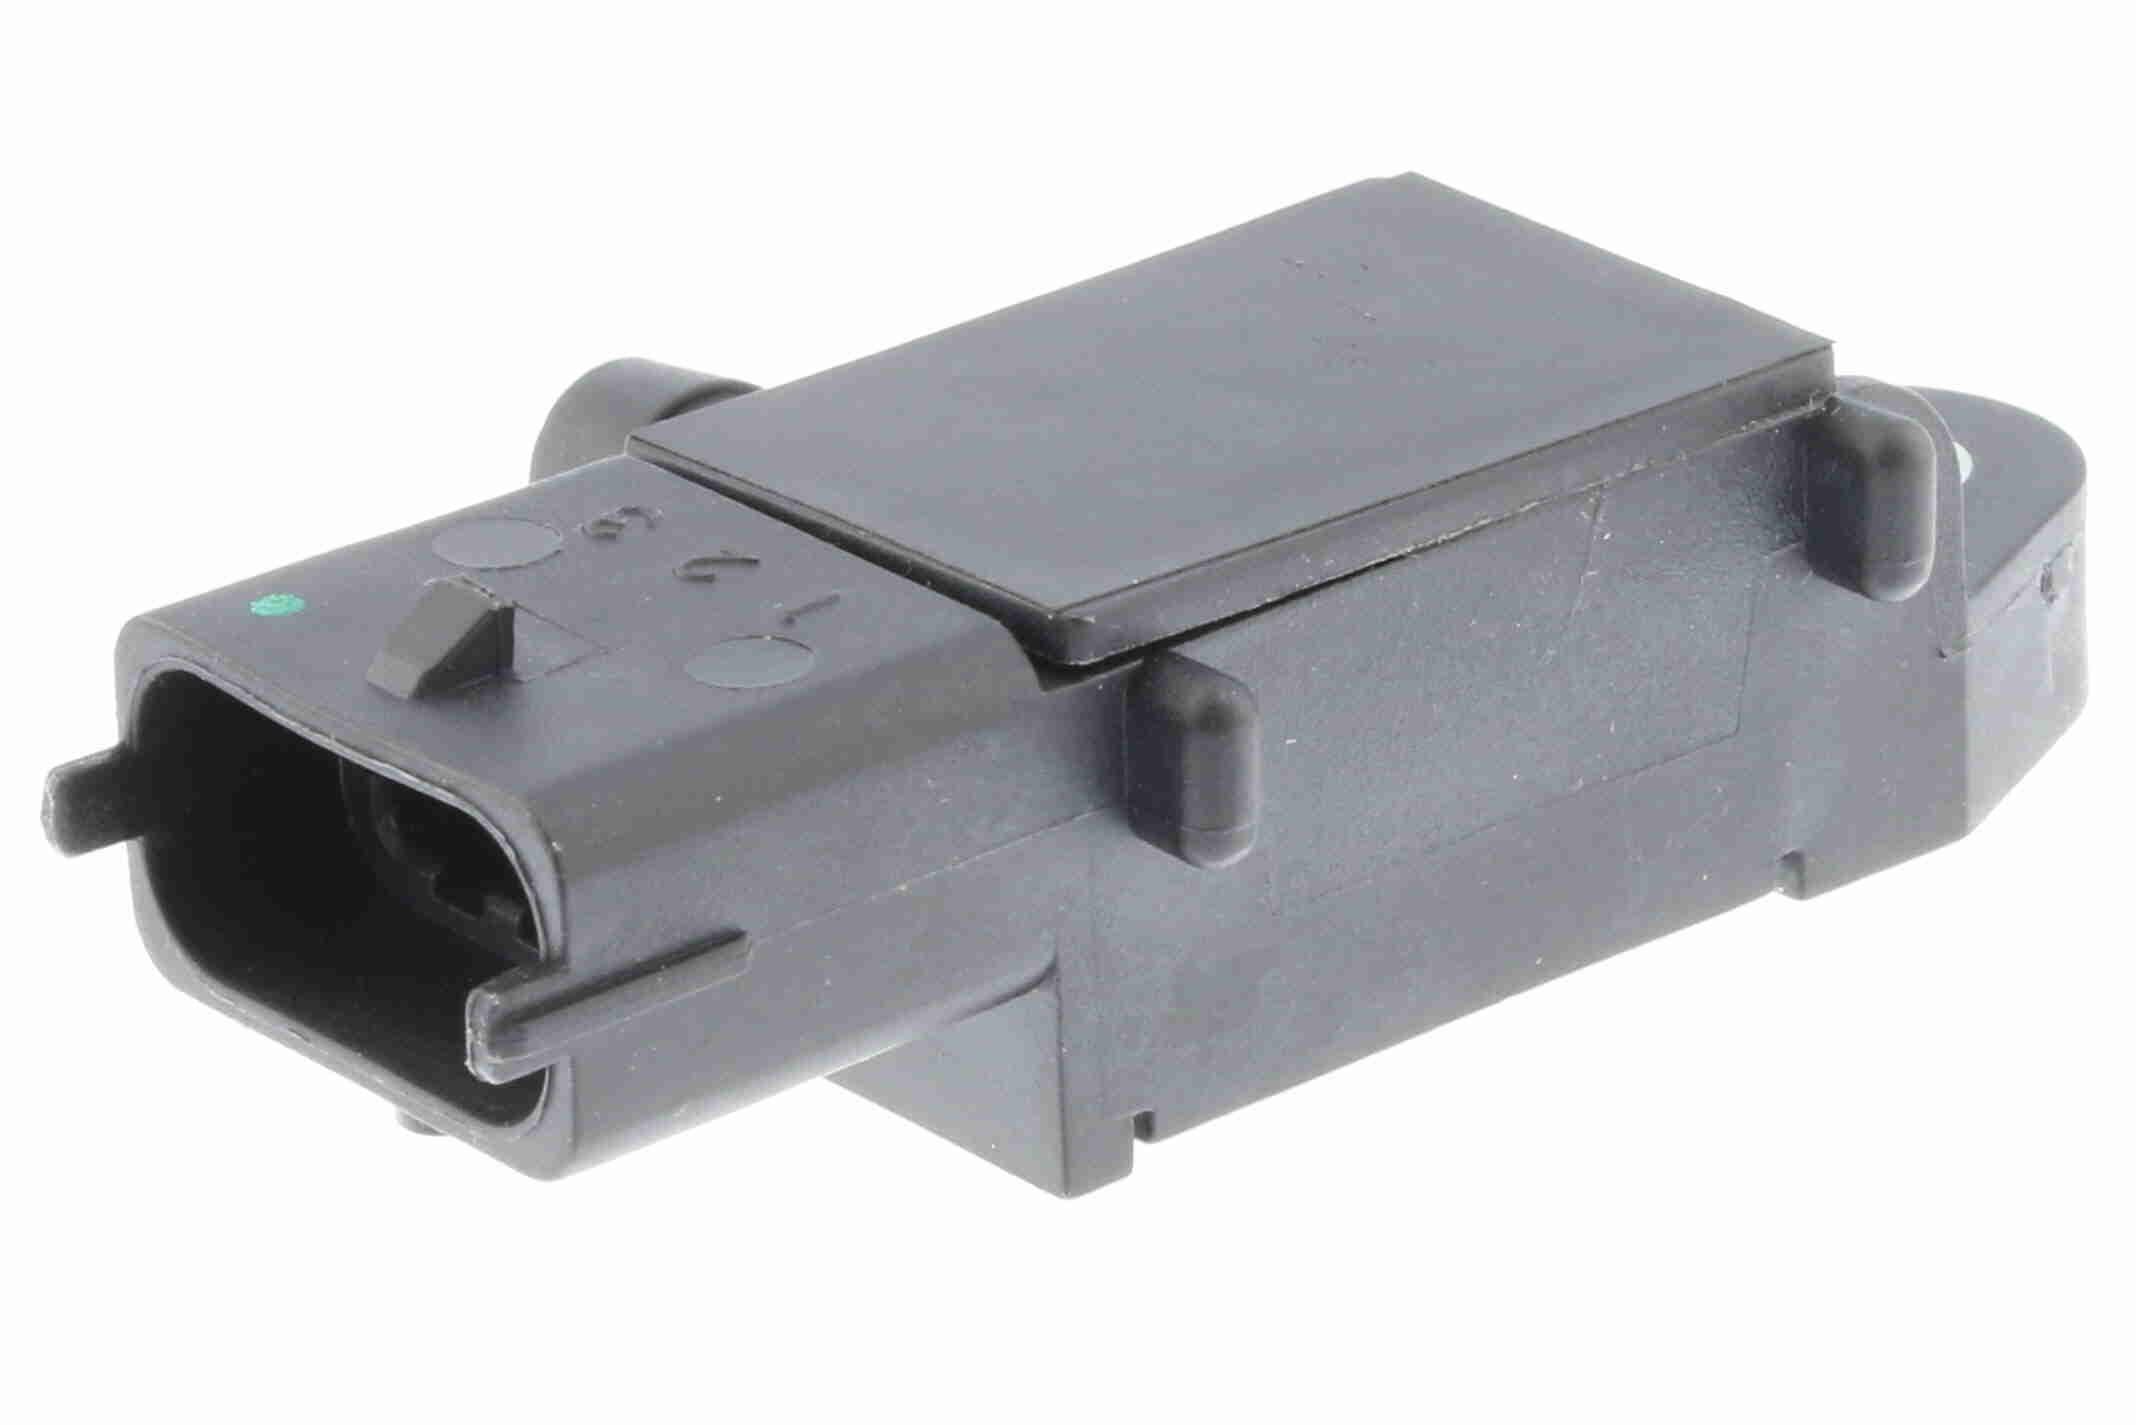 OPEL CORSA 2015 Abgasdrucksensor - Original VEMO V40-72-0565-1 Pol-Anzahl: 3-polig